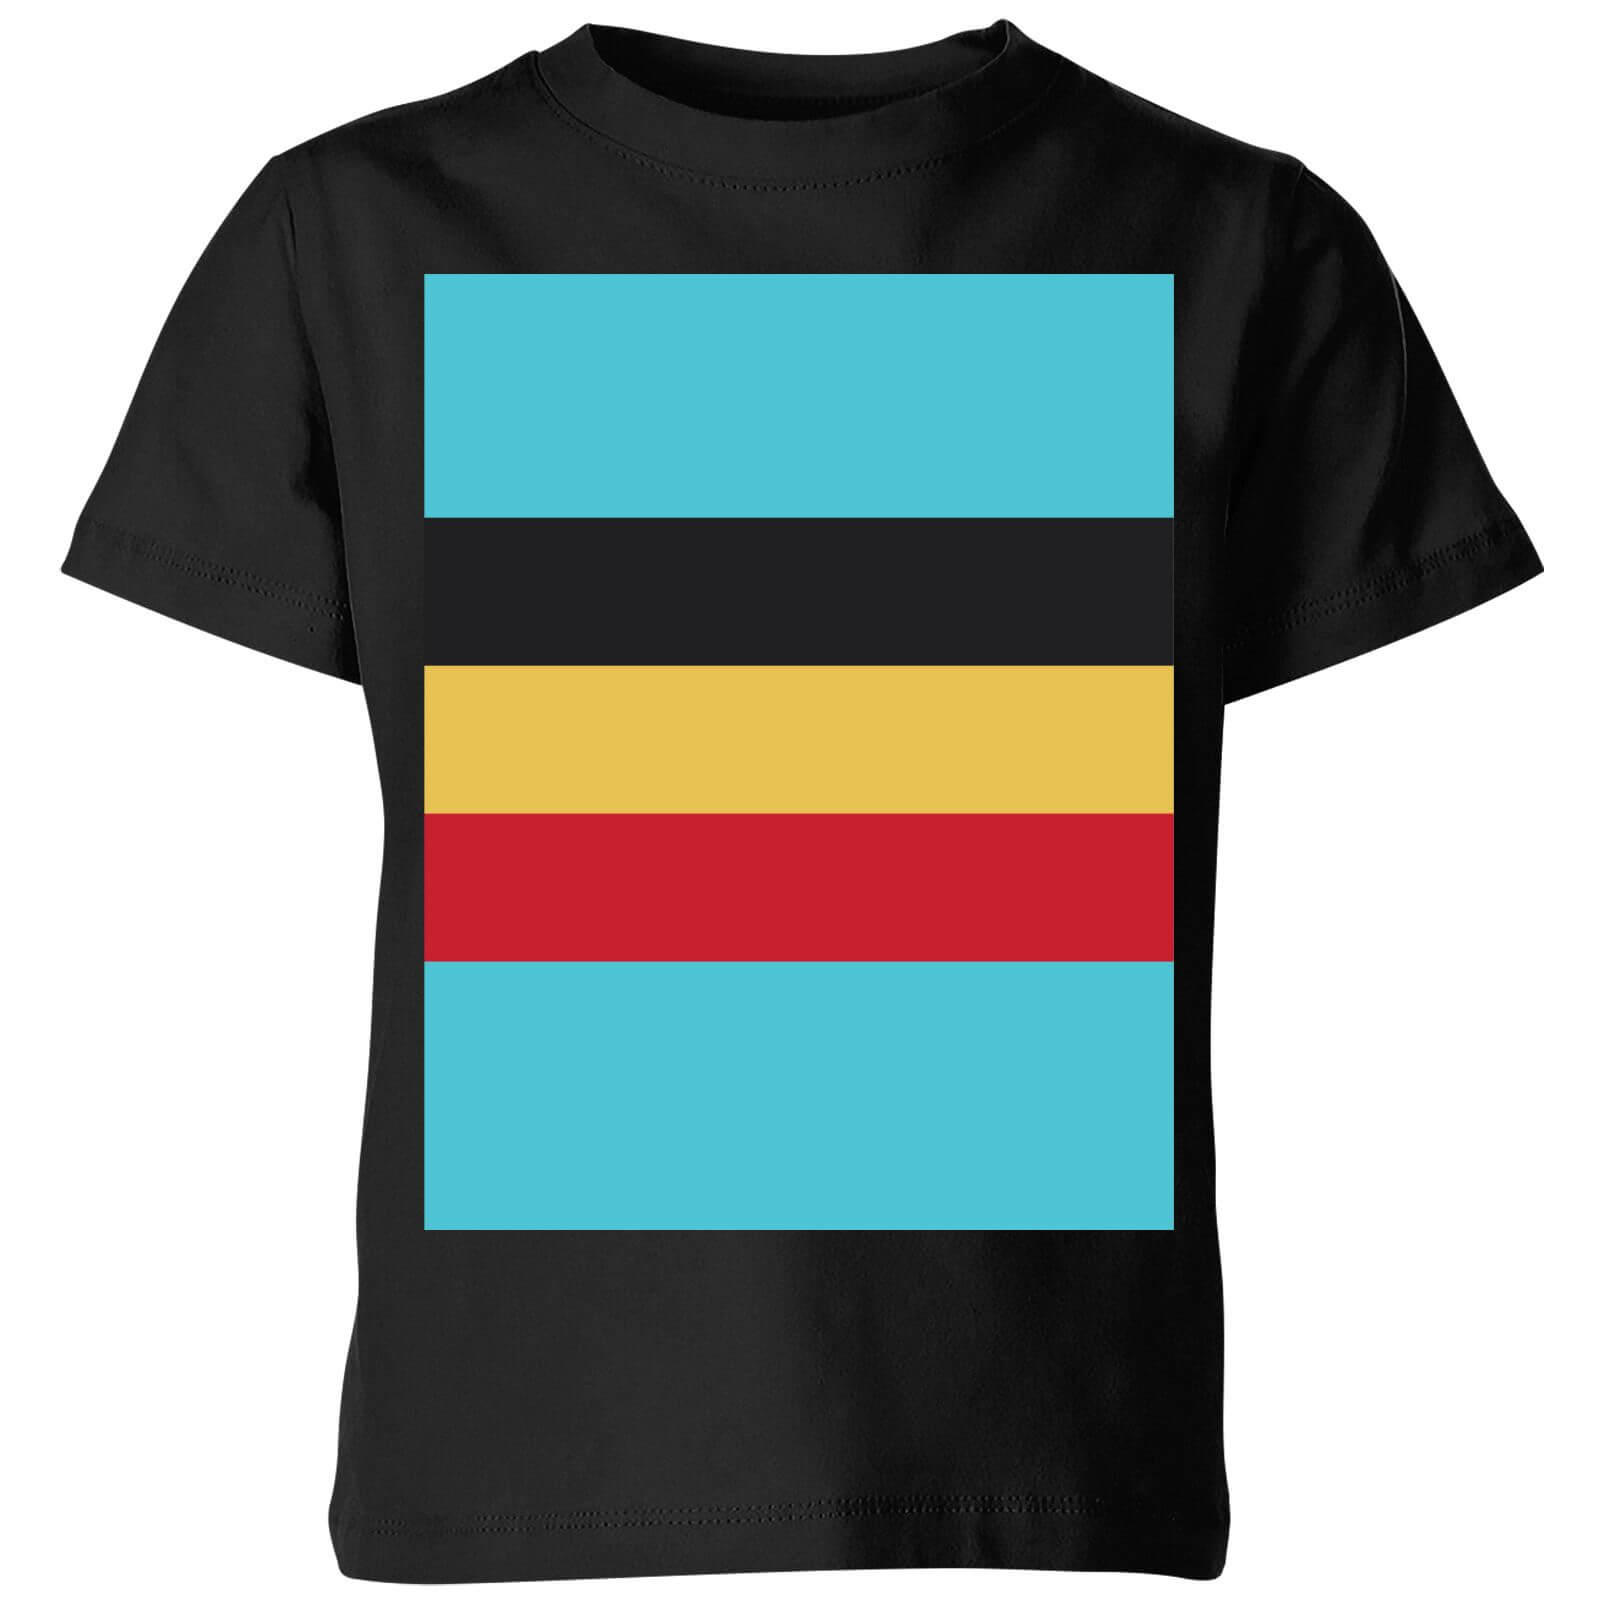 Summit Finish Belgium Flag Kids T-shirt - Black - 11-12 Years - Black